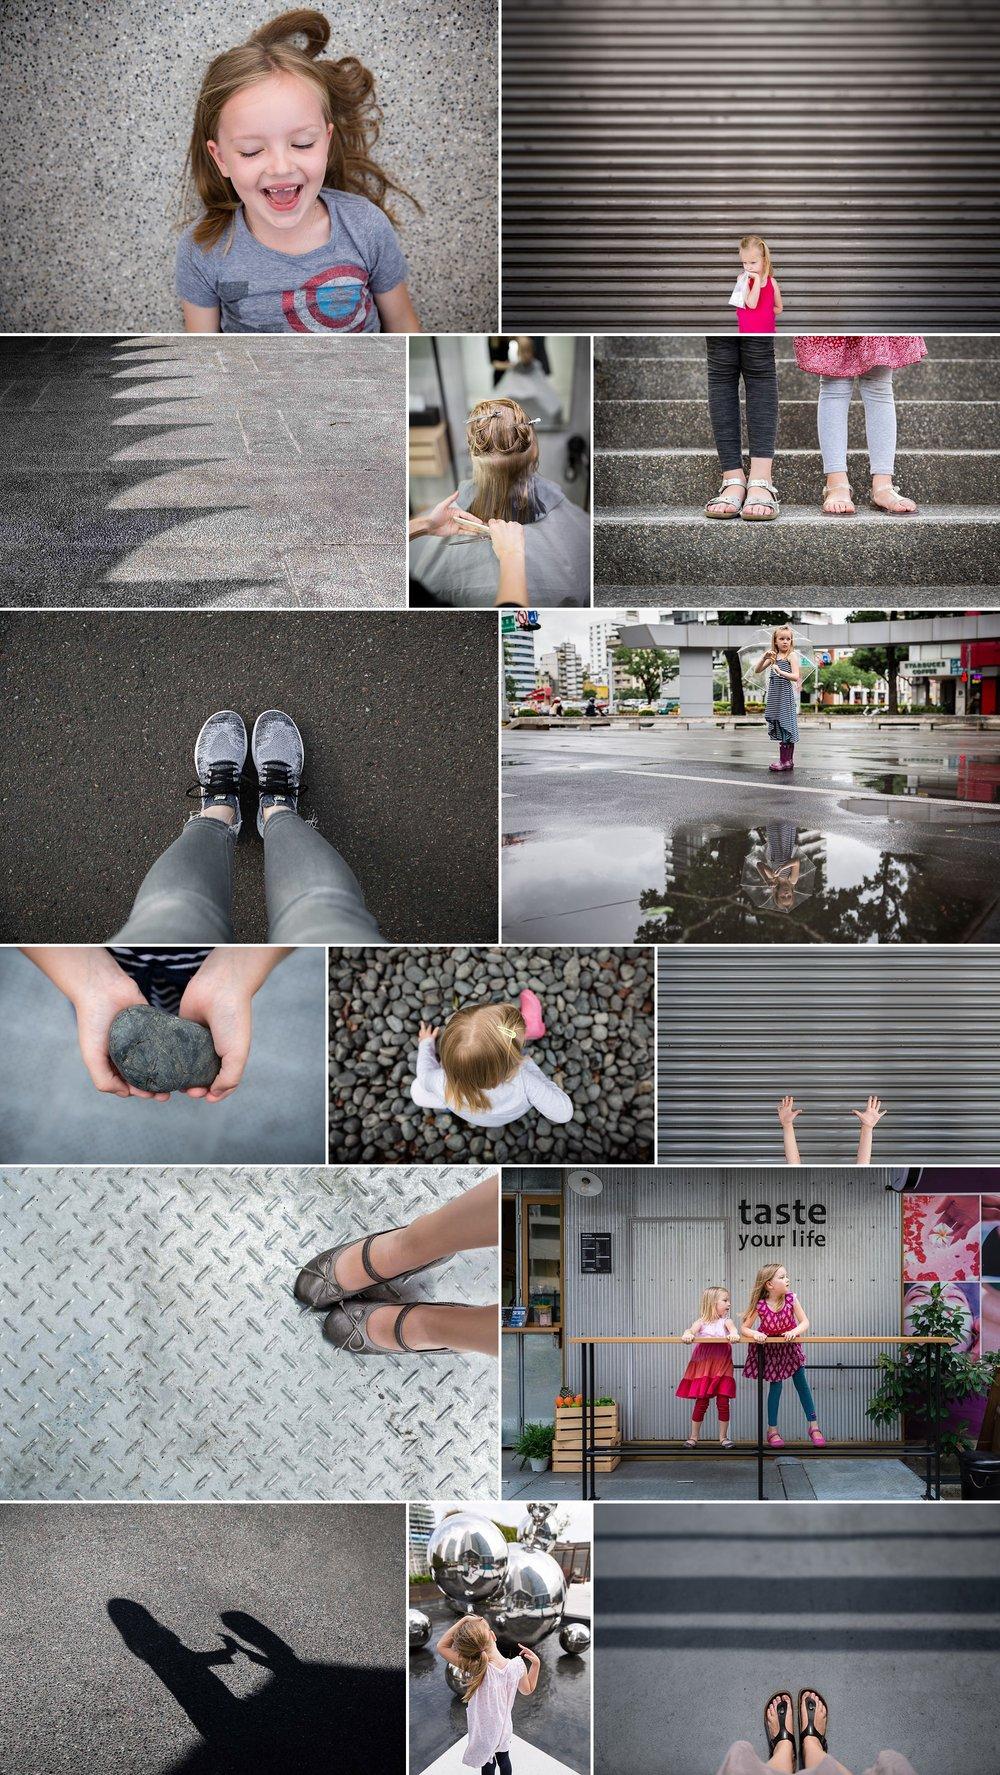 School_Pickup_Joy_Collage_0001